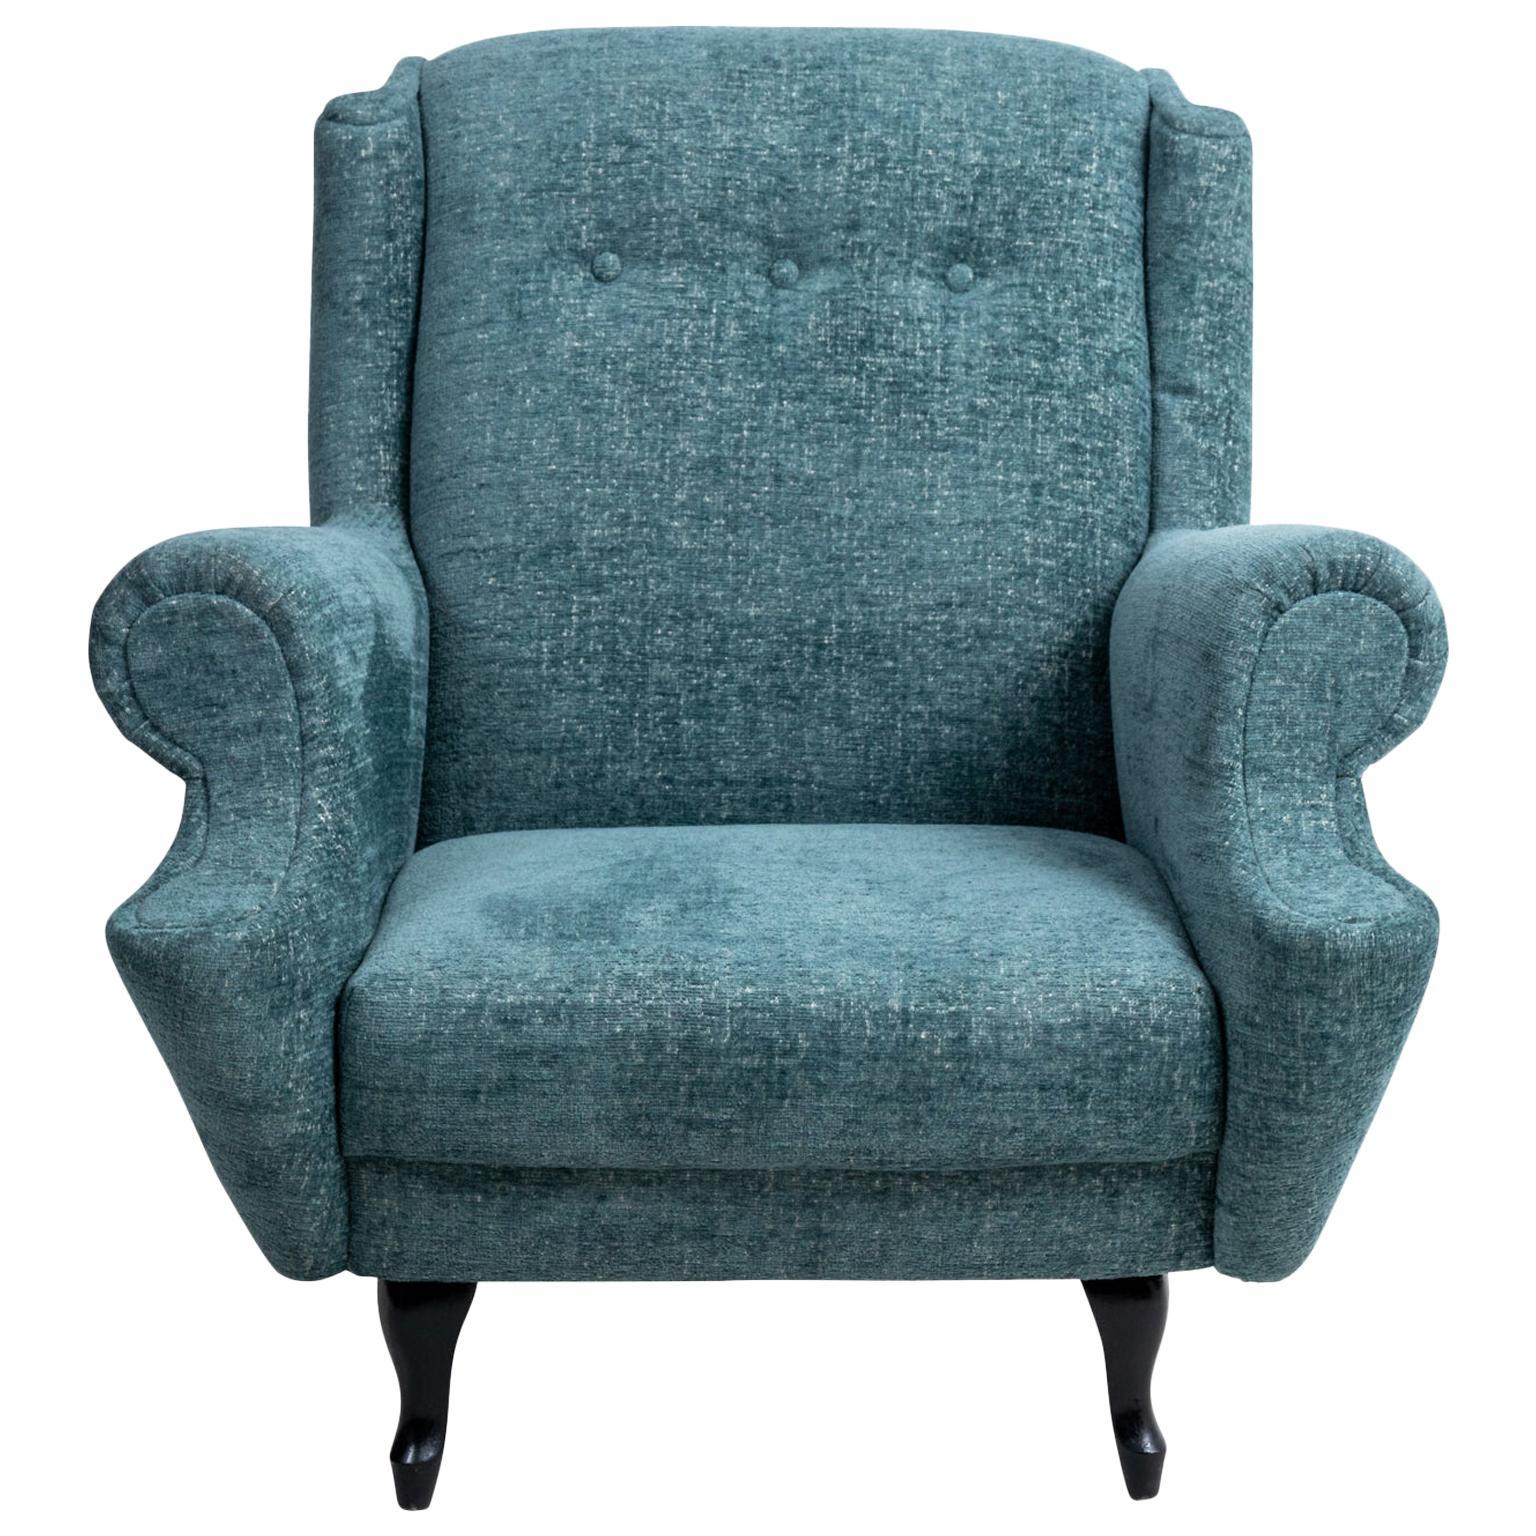 Mid-Century Modern Roll Arm Lounge Chair